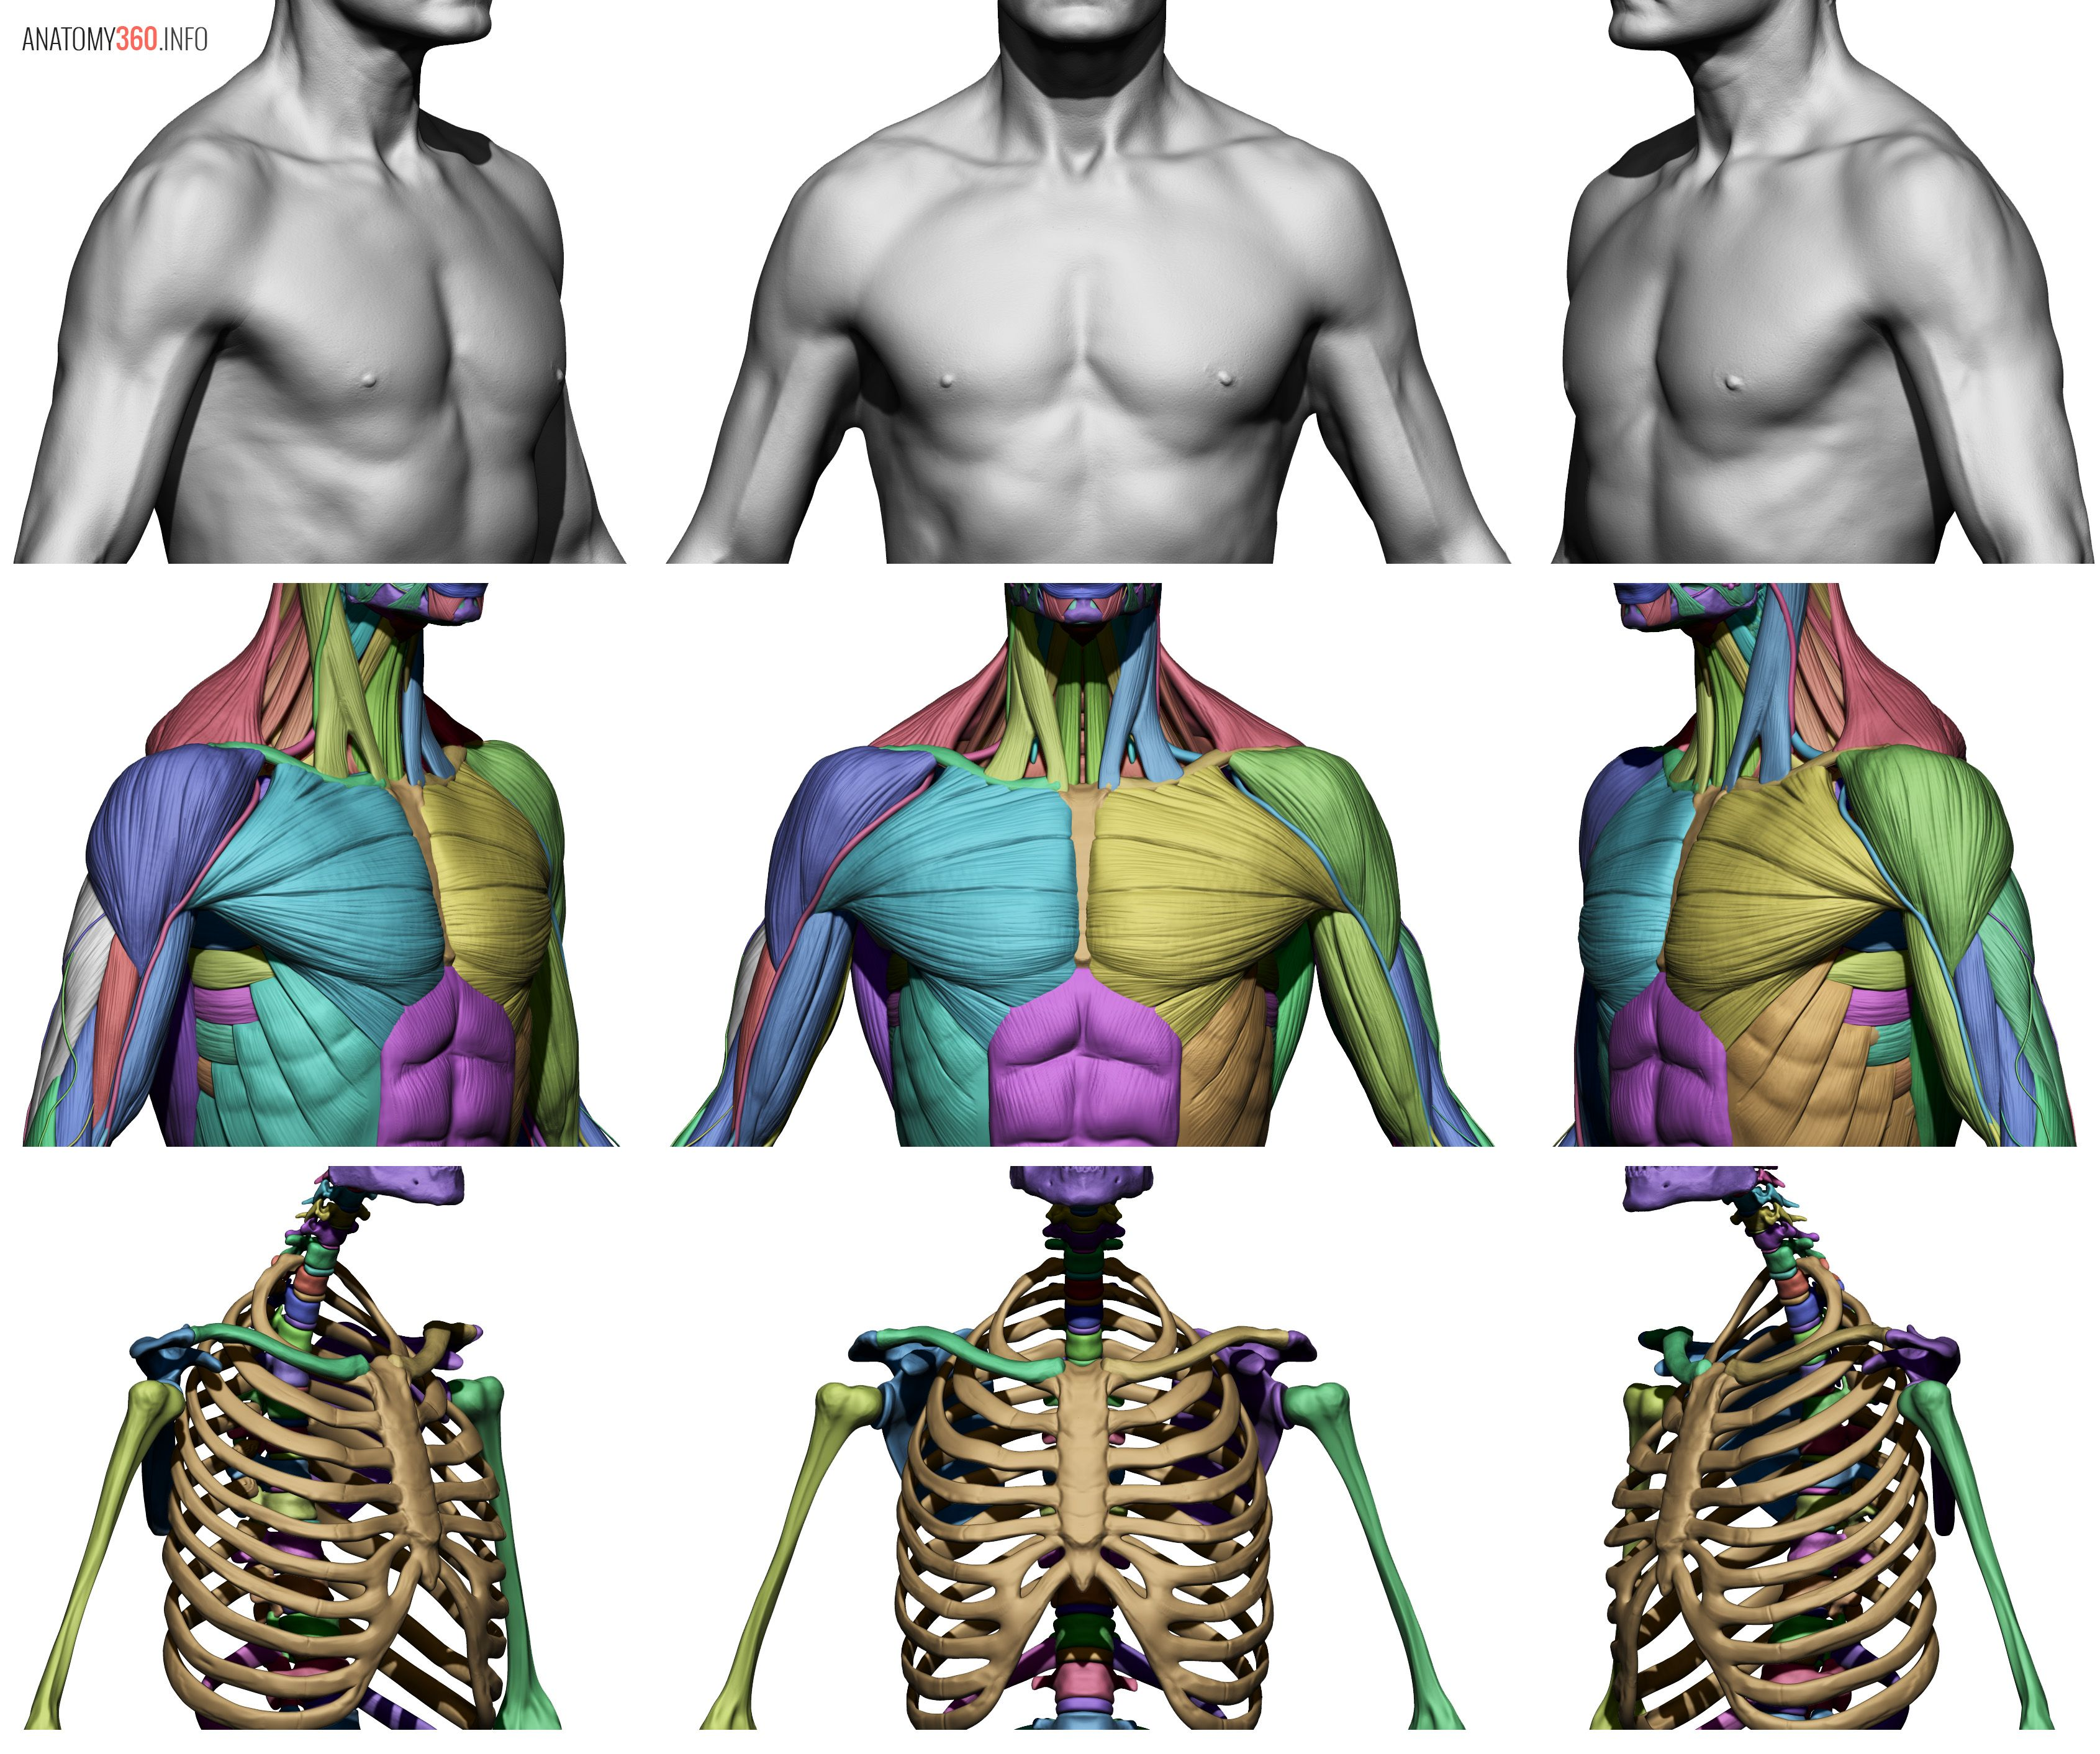 Front.jpg (3382×2825) | Anatomy | Pinterest | Anatomía, Modelado y 3d